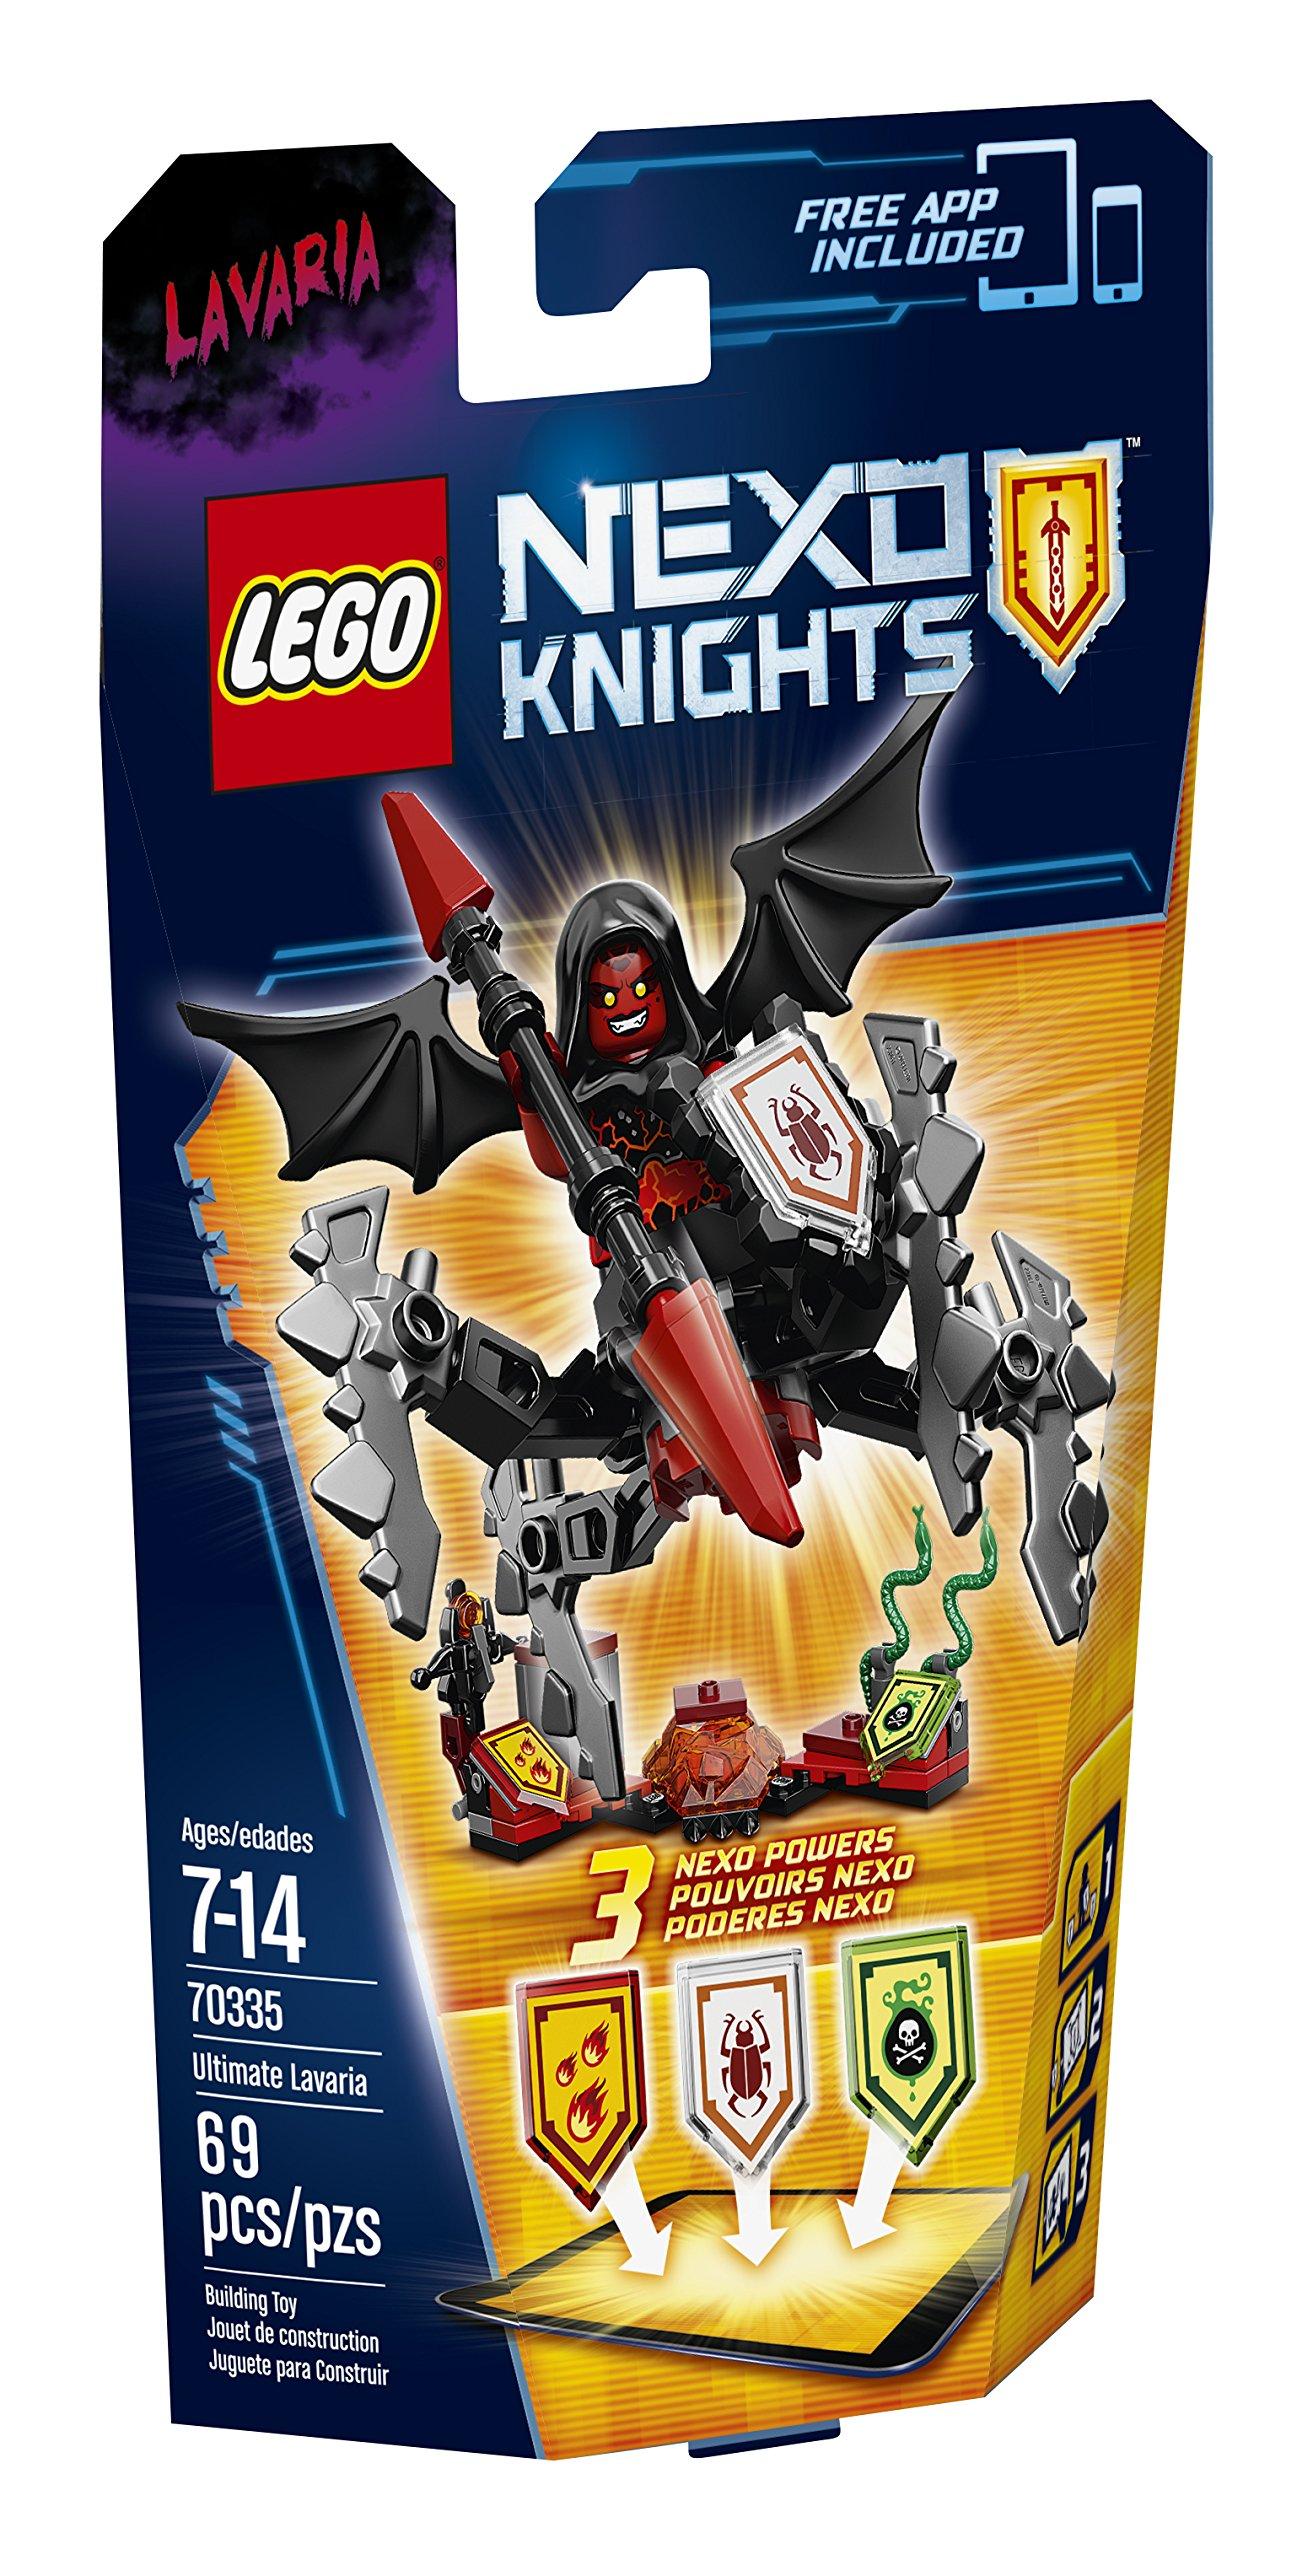 Lego Nexoknights Ultimate Lavaria 70335 14